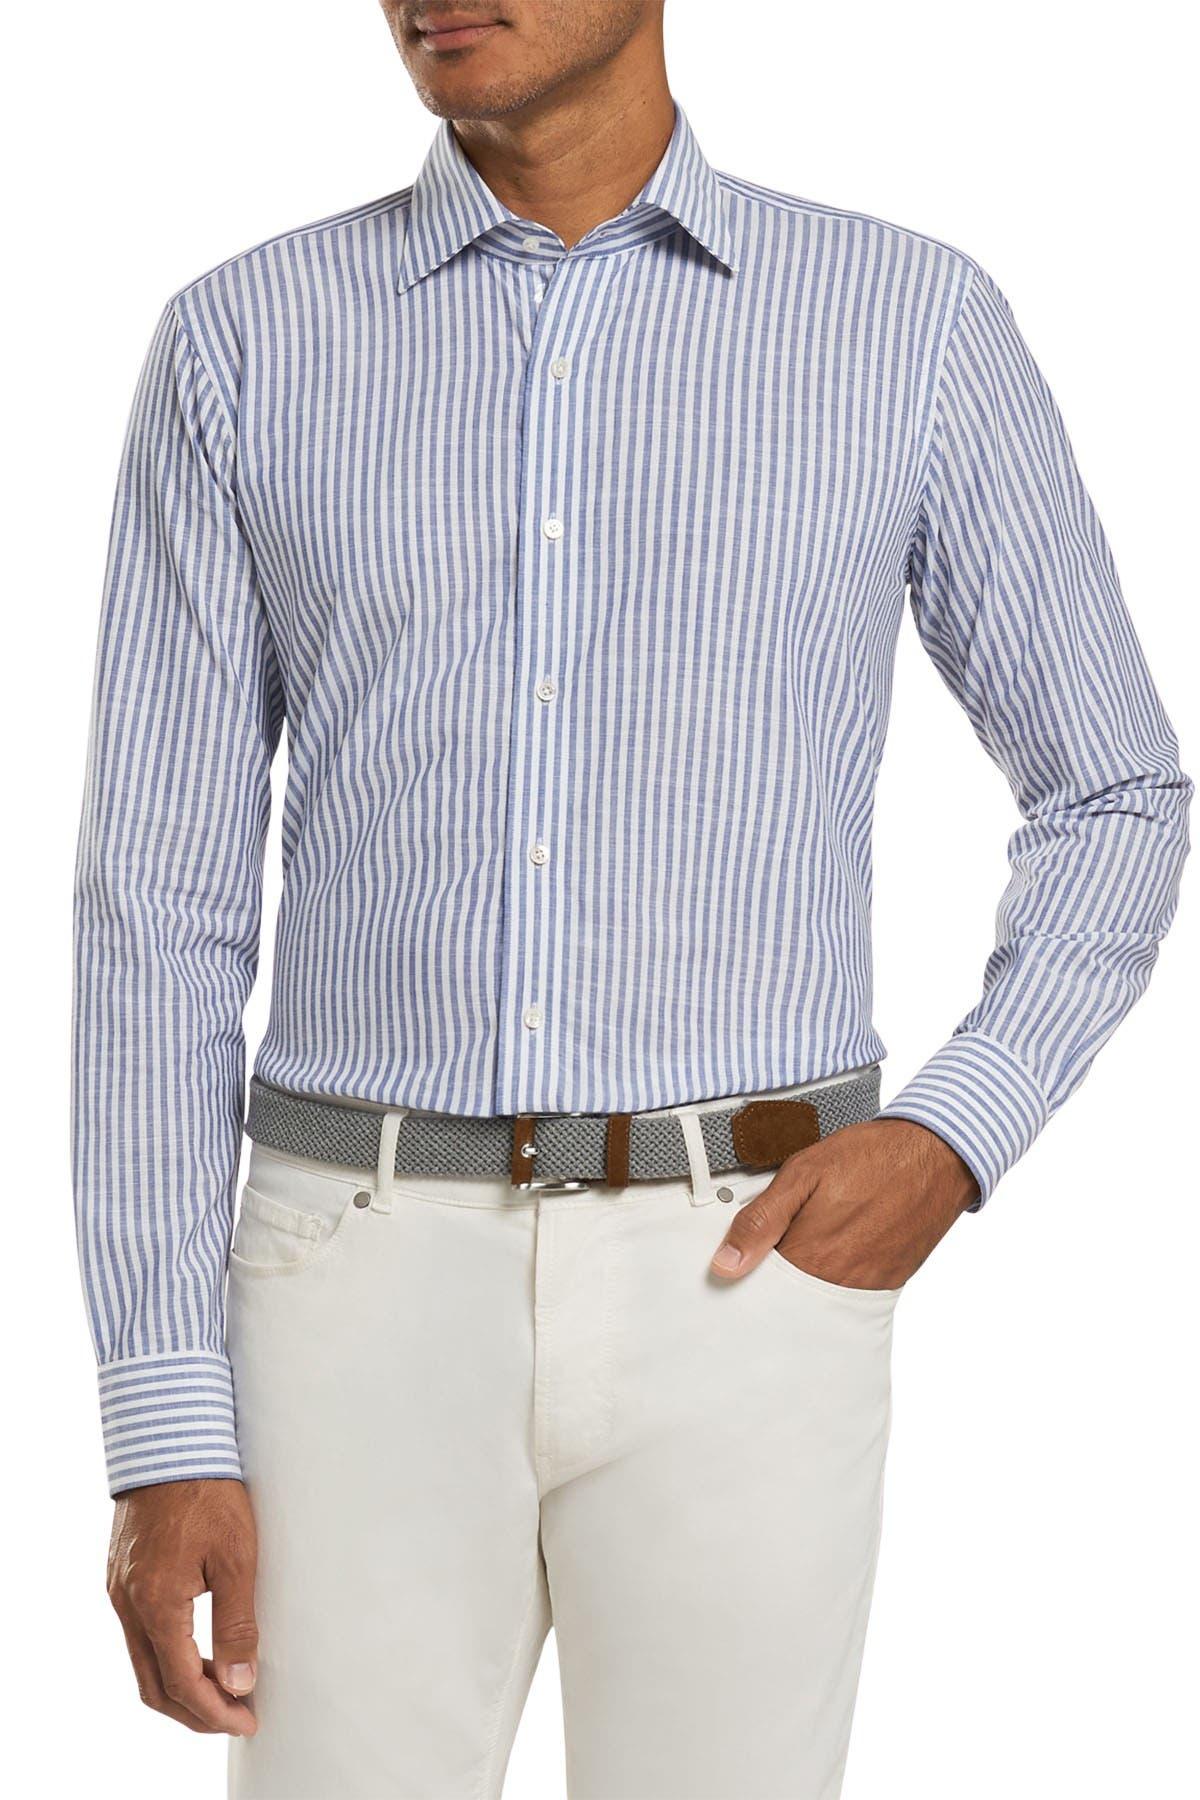 Image of Peter Millar Summer Chambray Stripe Shirt